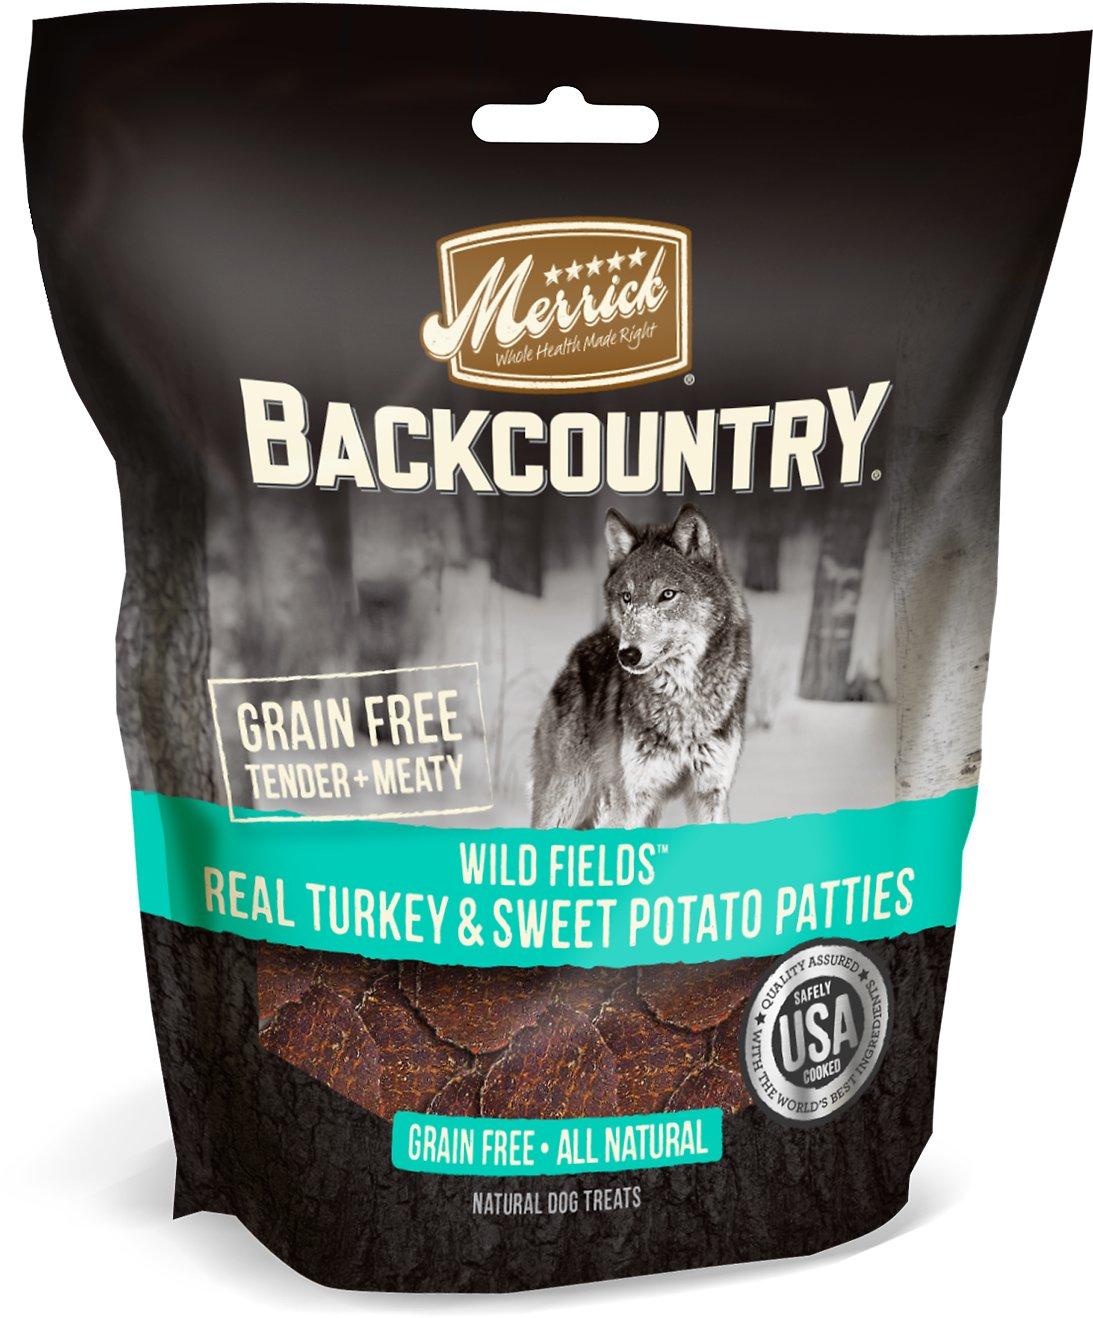 Merrick Backcountry Wild Fields Real Turkey & Sweet Potato Patties Dog Treats, 4-oz bag